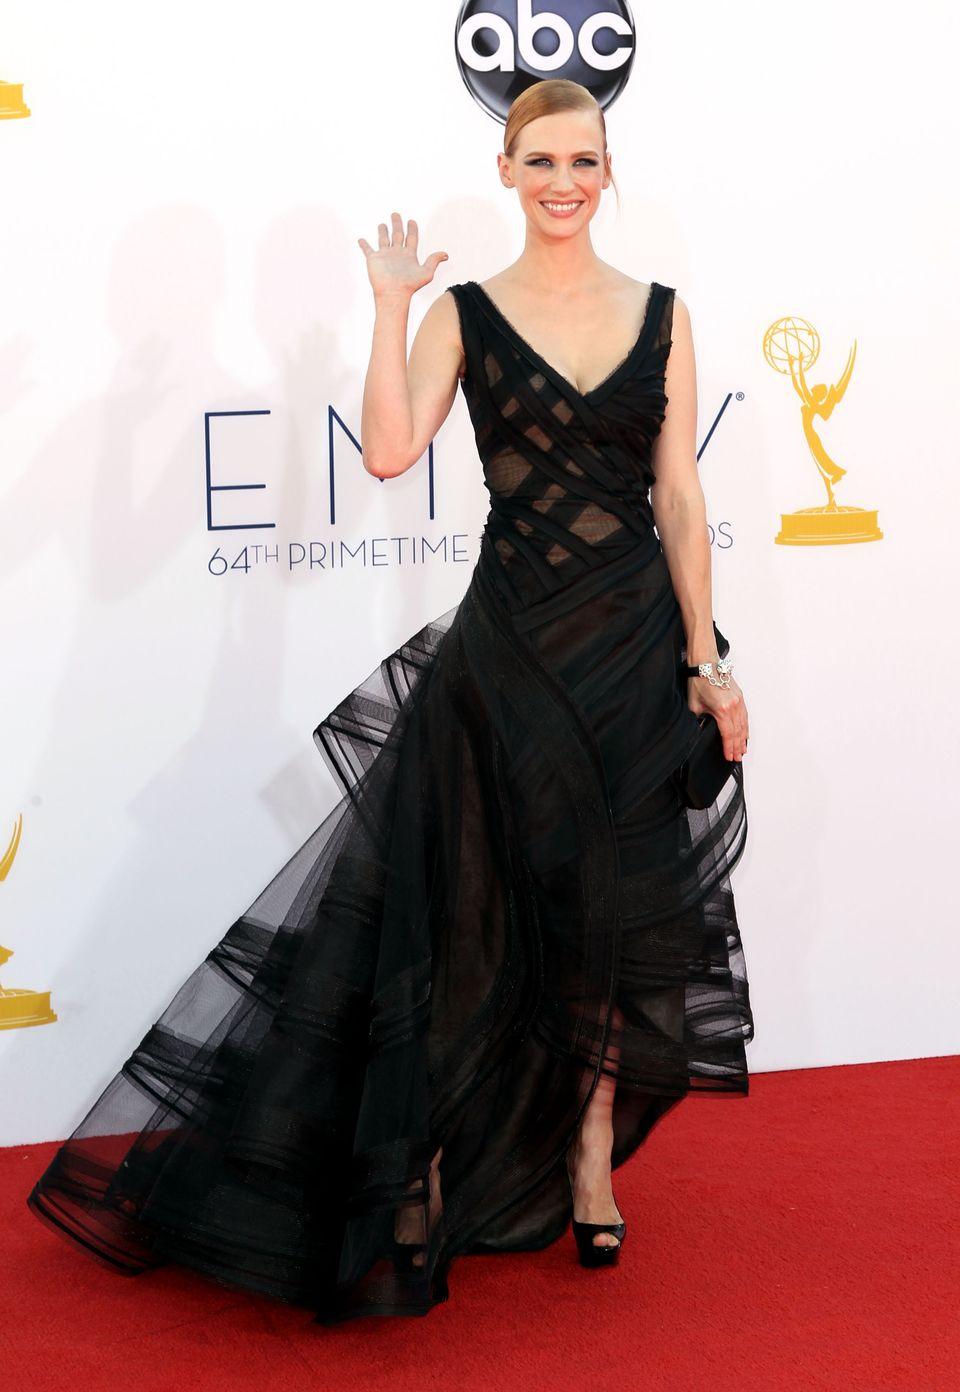 Giuliana Rancic - 2012 Emmy Awards, Red Carpet Looks